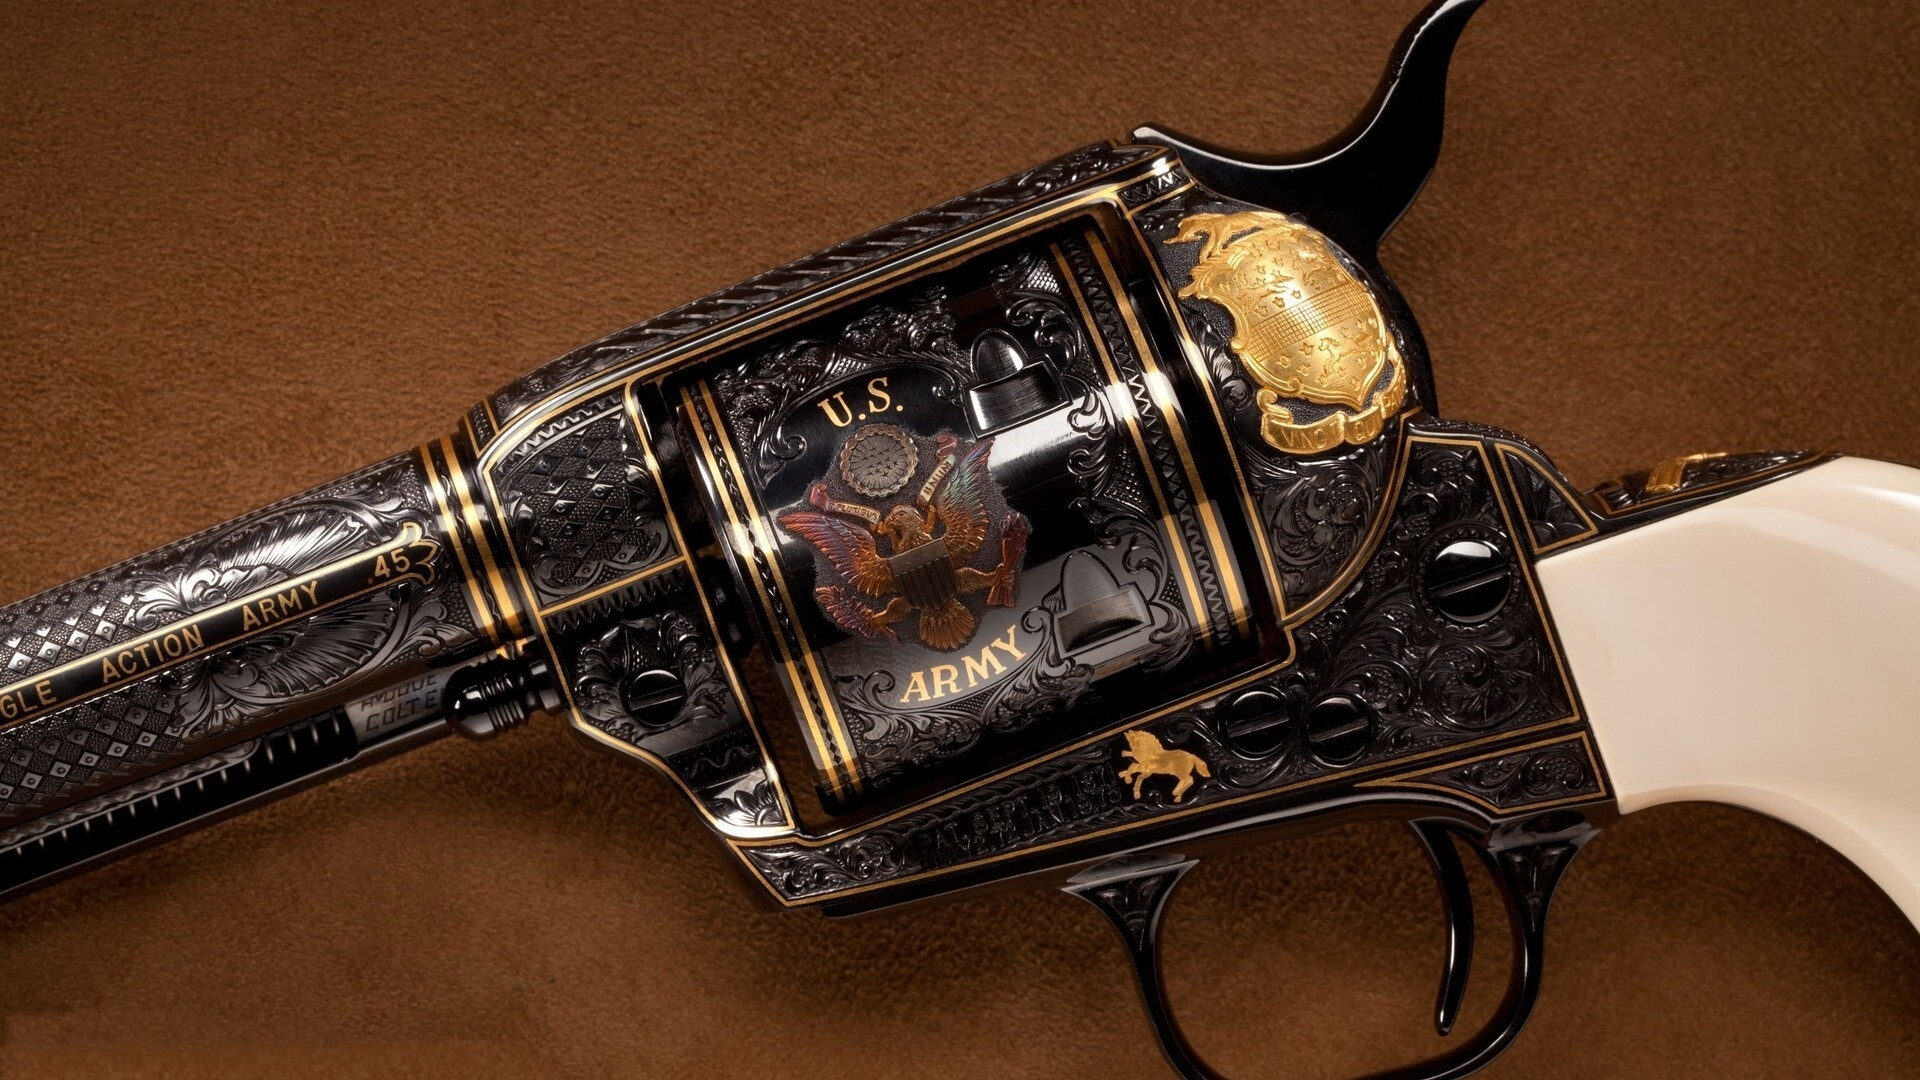 Colt Hand Gun Revolver Hd Desktop Images